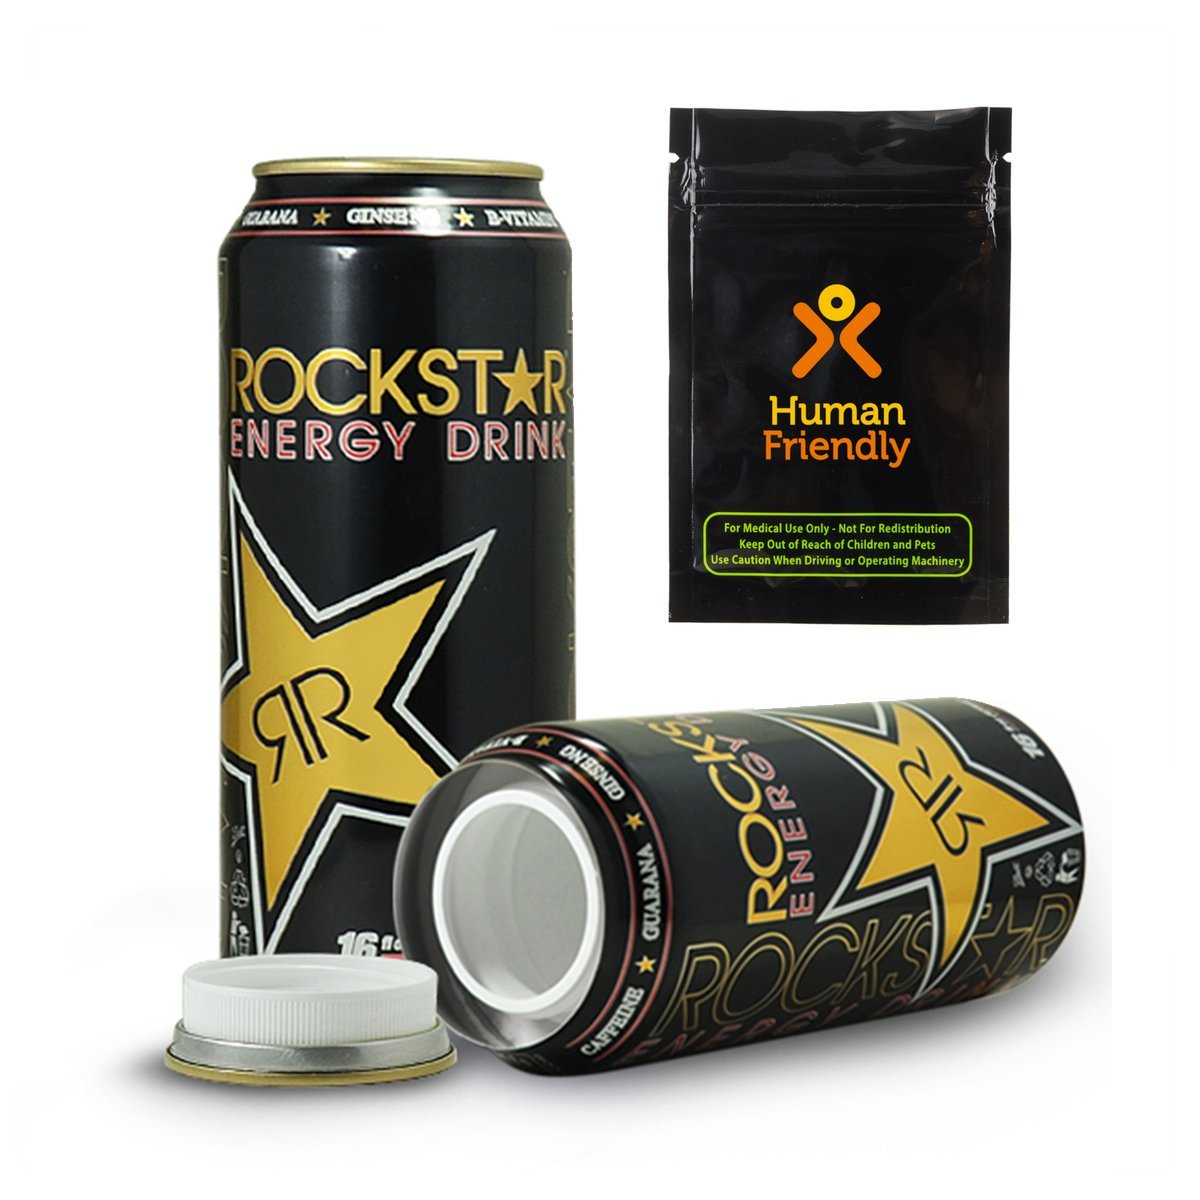 Rockstar Energy Drink Diversion Safe Stash Can 16 oz w HumanFriendly Smell-Proof Bag